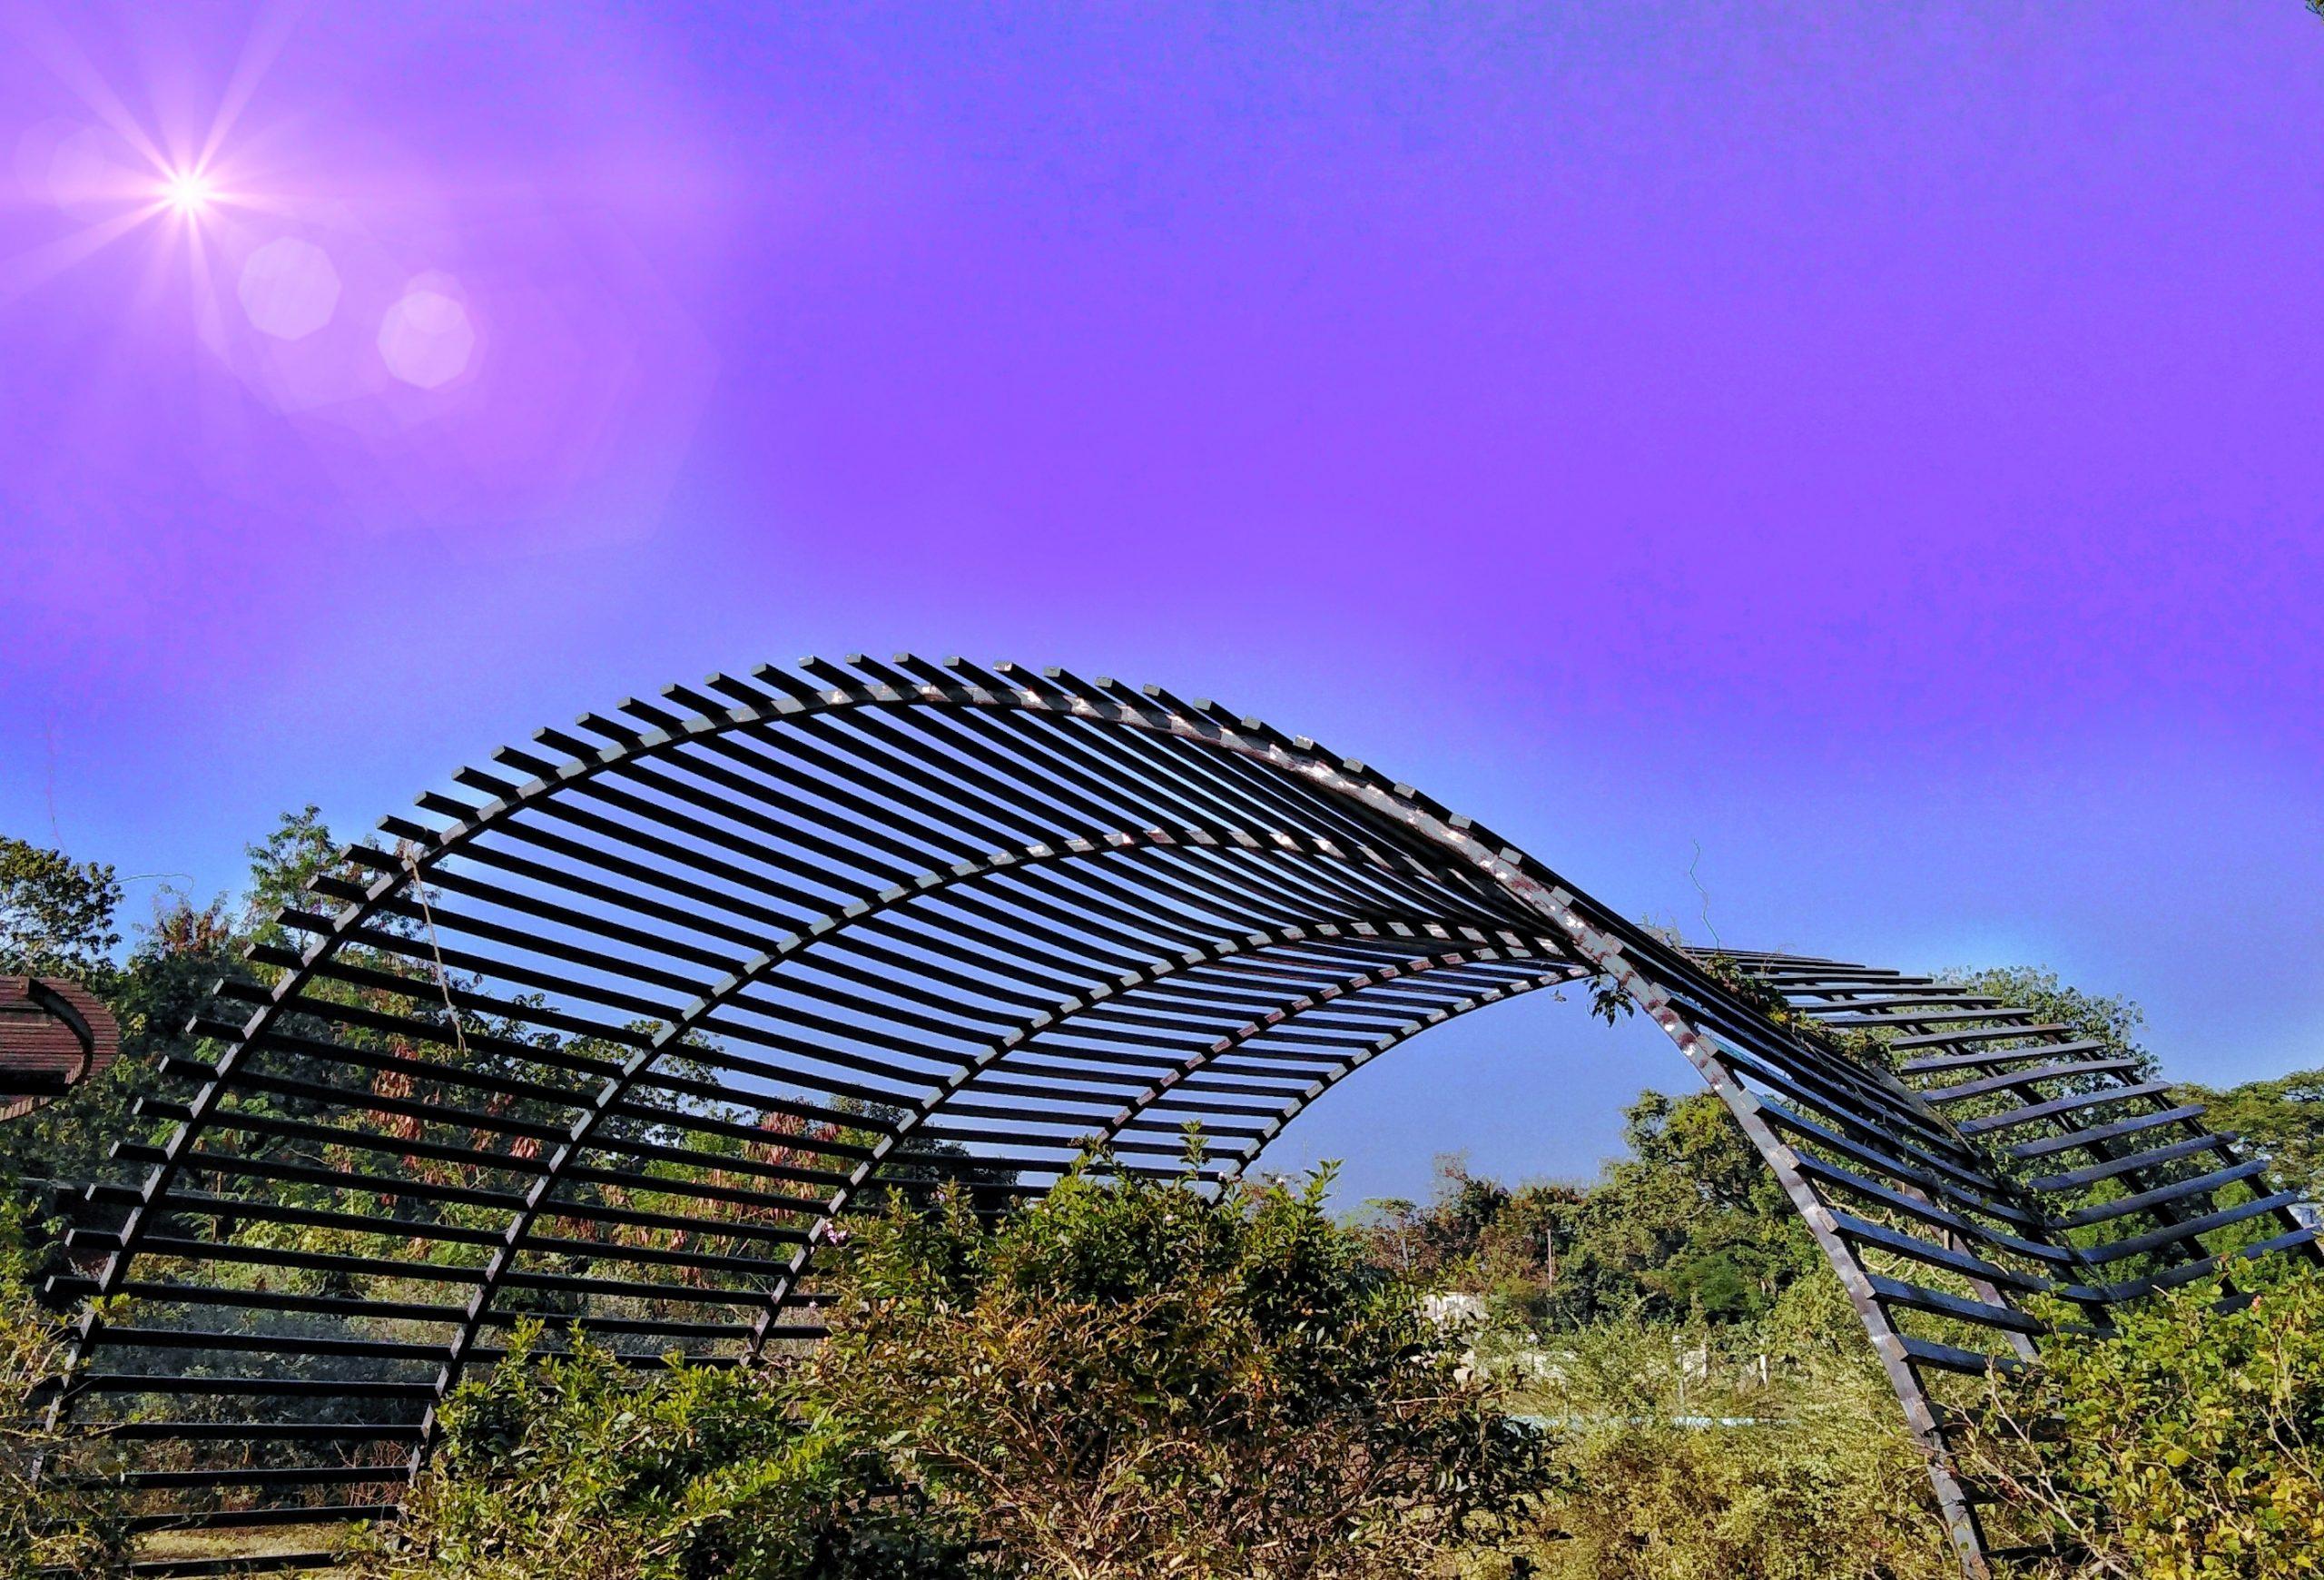 Steel pavilion in a park